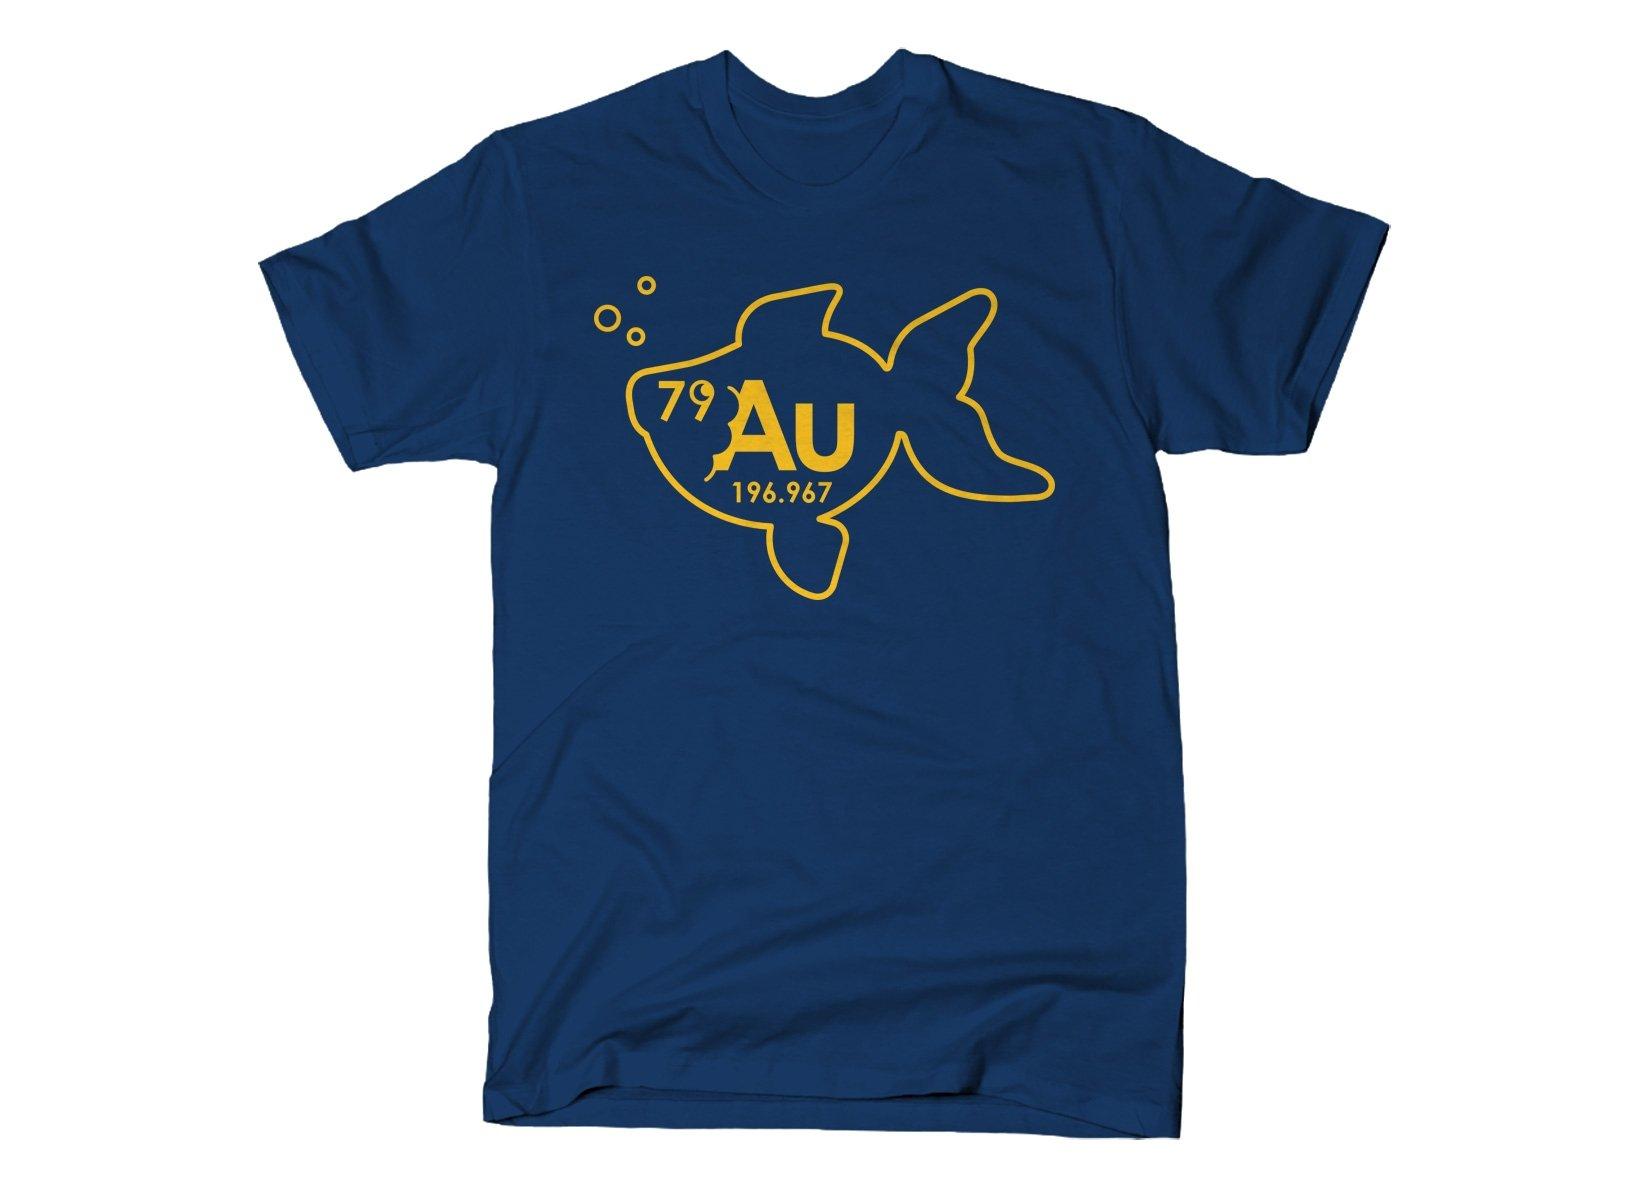 Goldfish on Mens T-Shirt